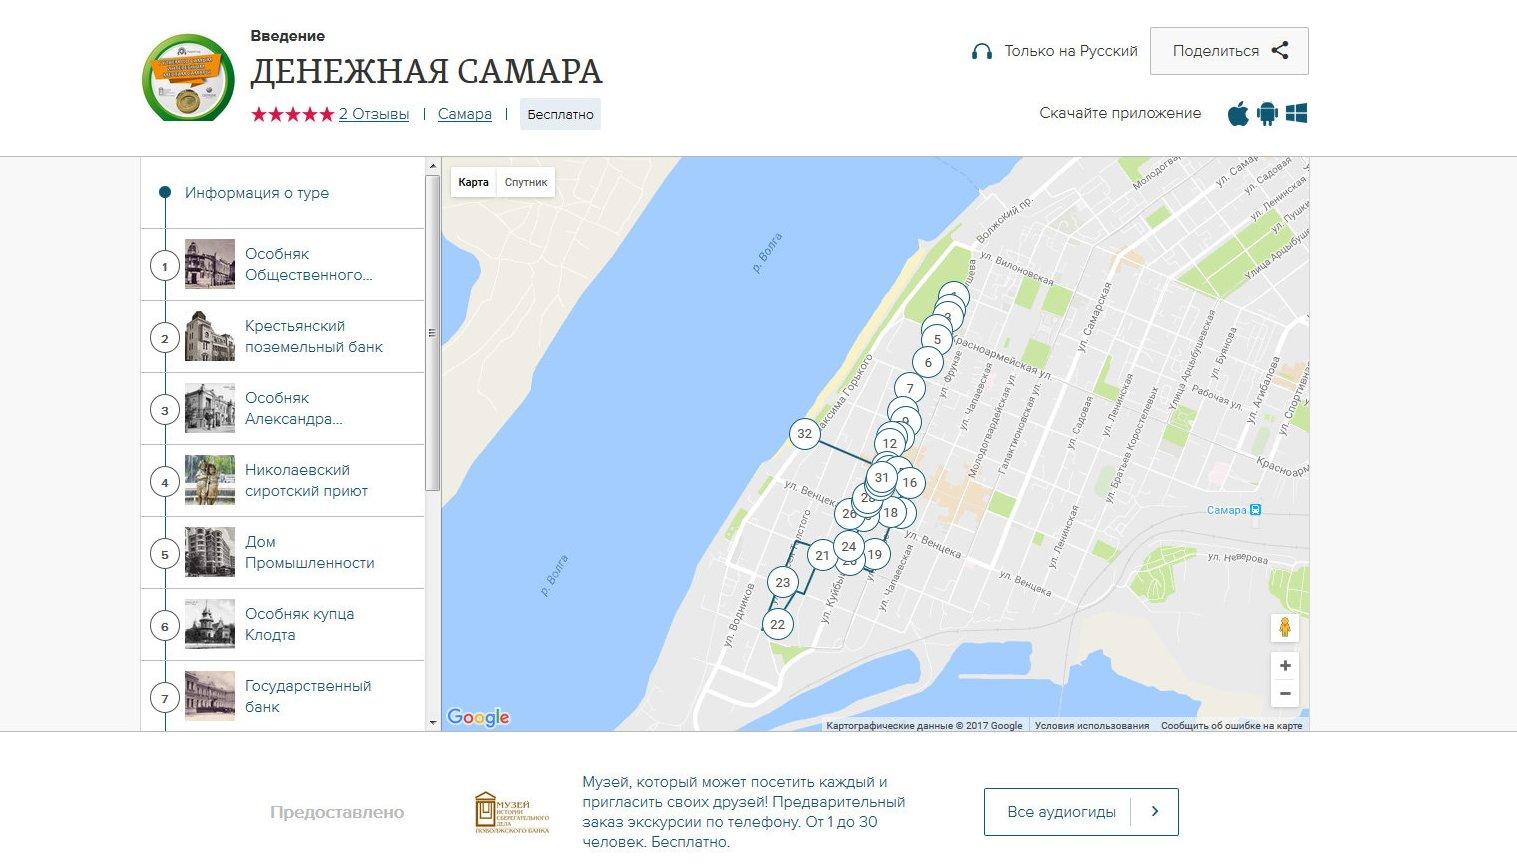 Аудиогид Денежная Самара